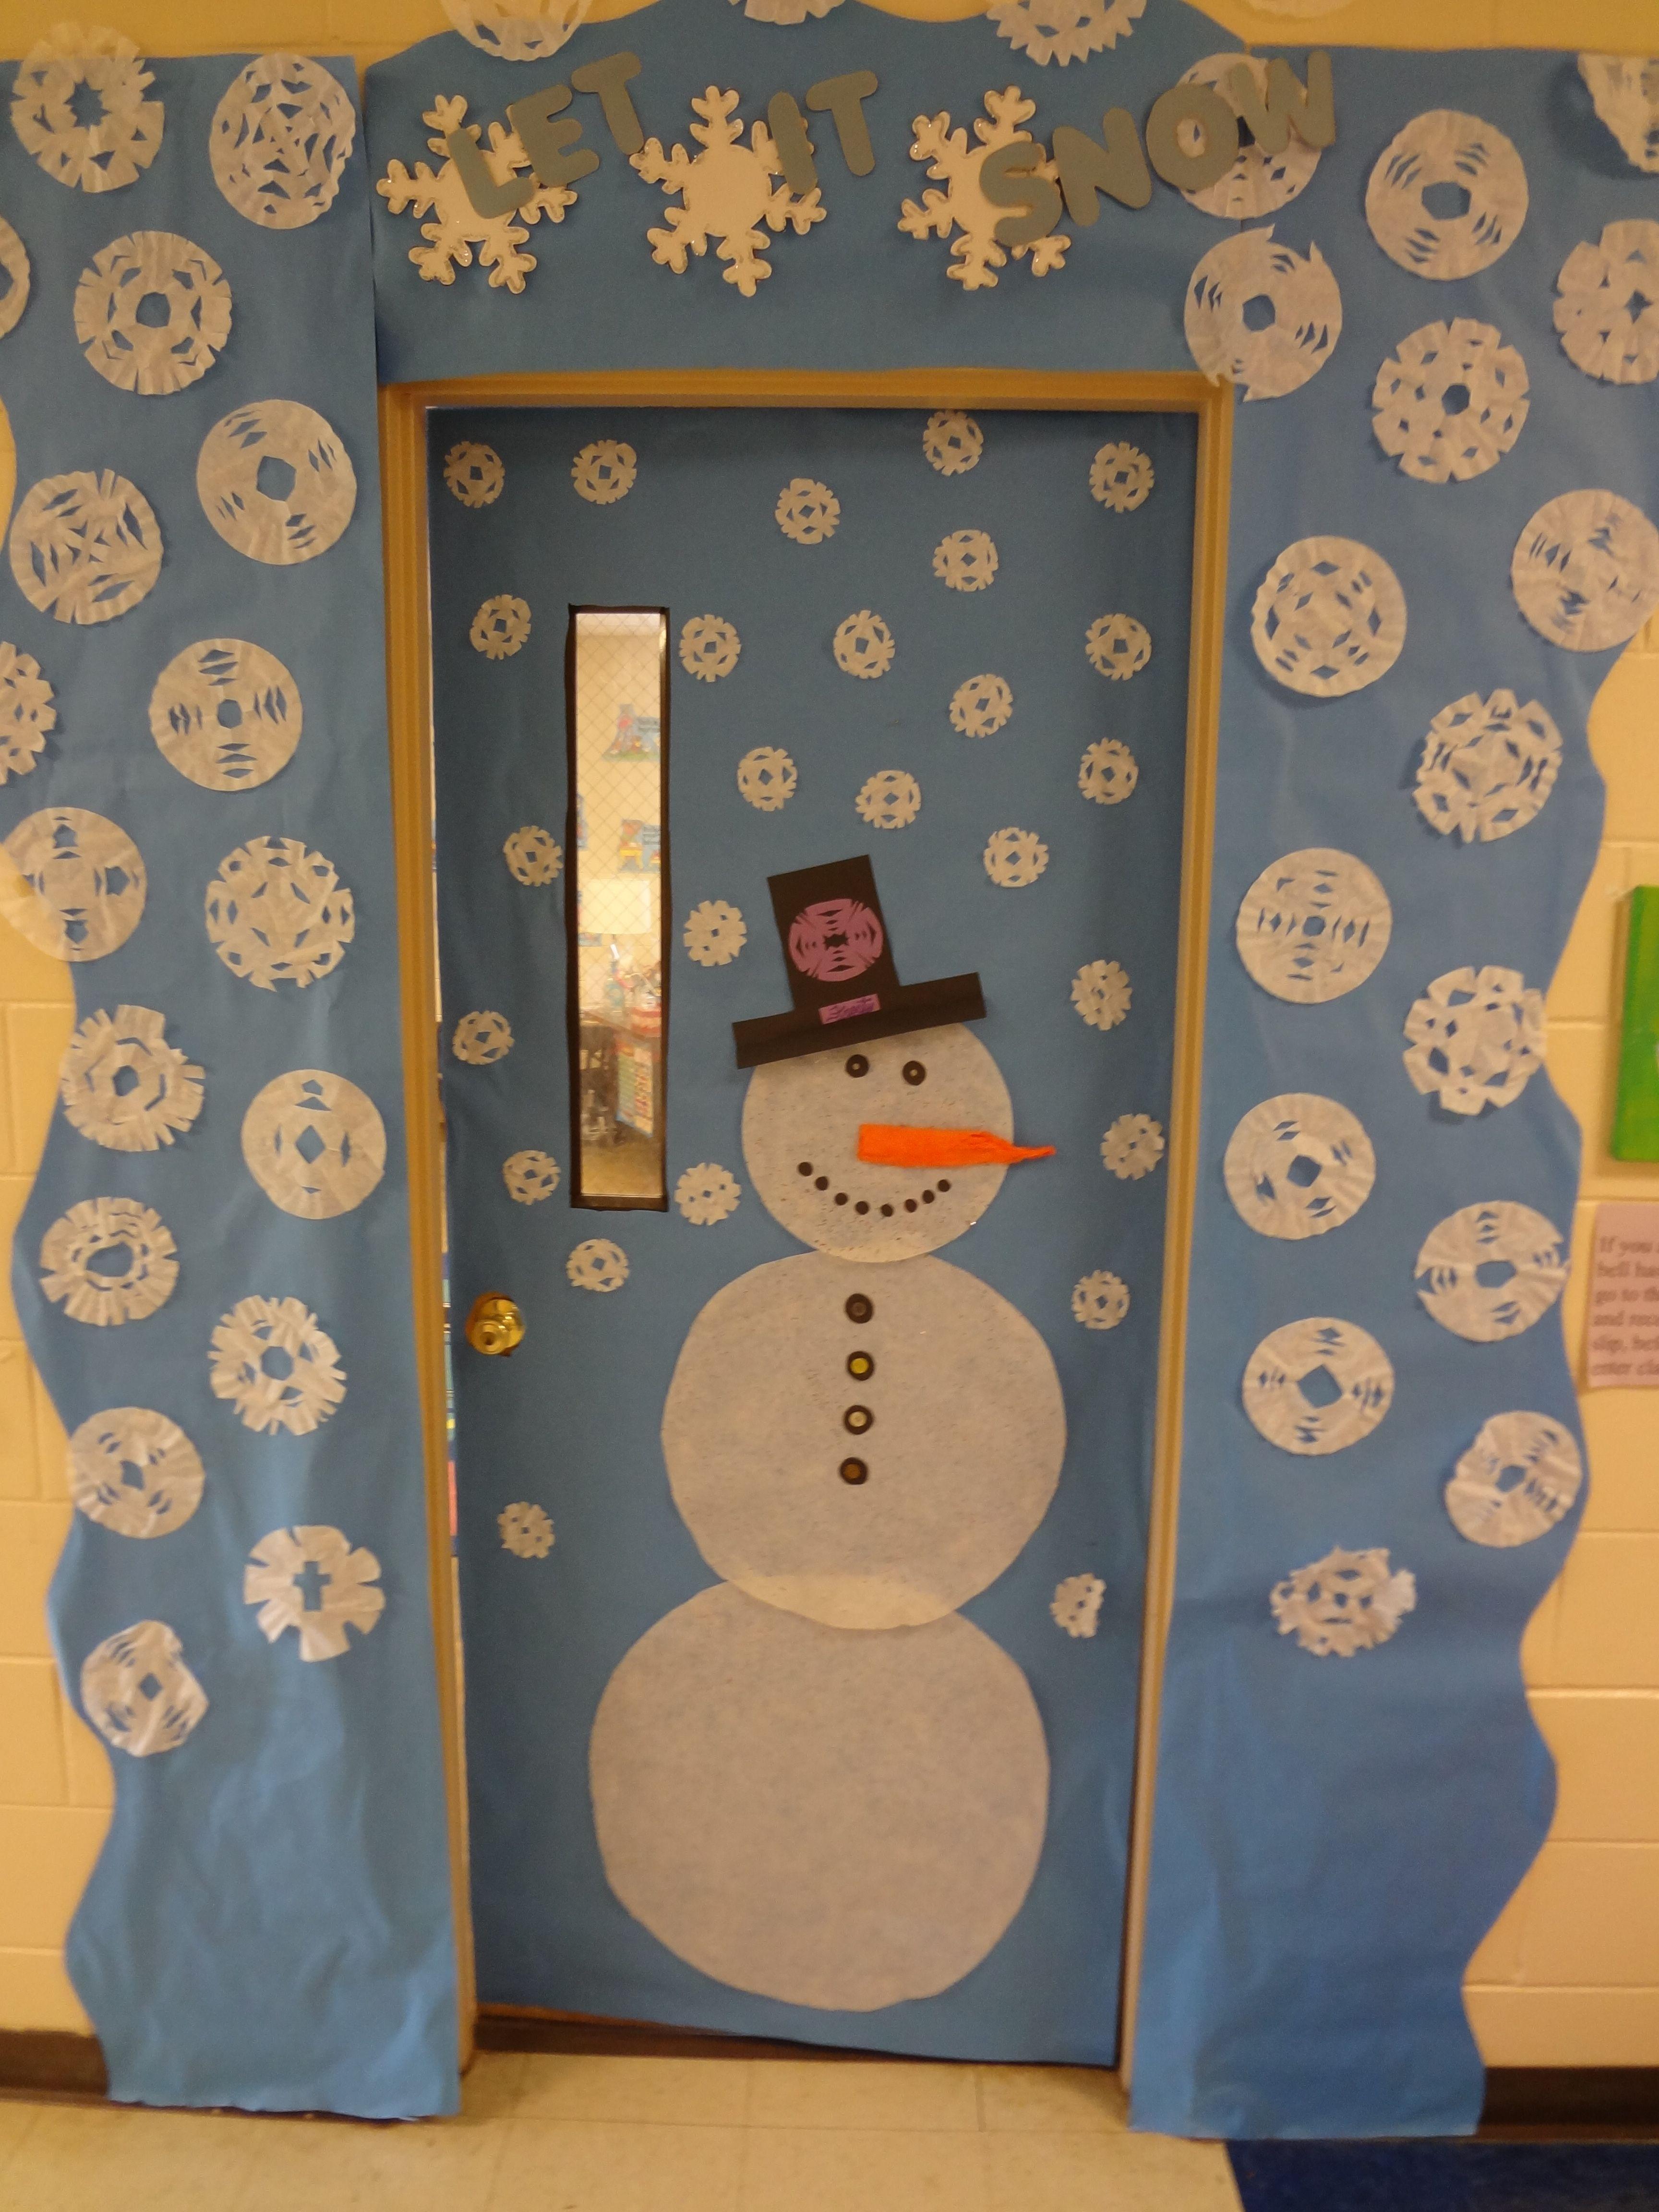 Classroom Door Decoration Ideas For January ~ Classroom door decorations for january